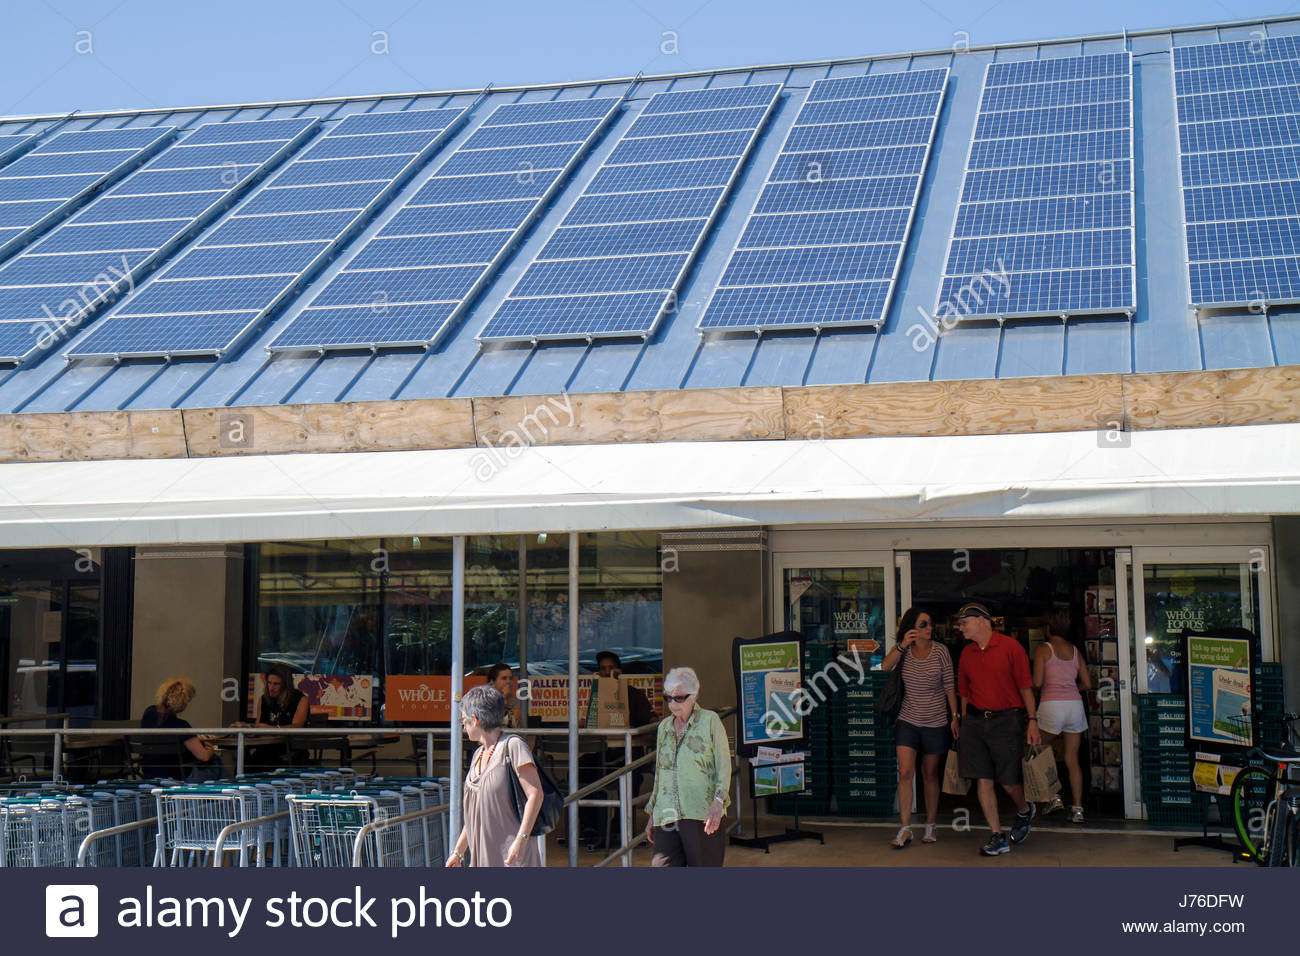 Solar Panels At Beach Stock Photos & Solar Panels At Beach Stock